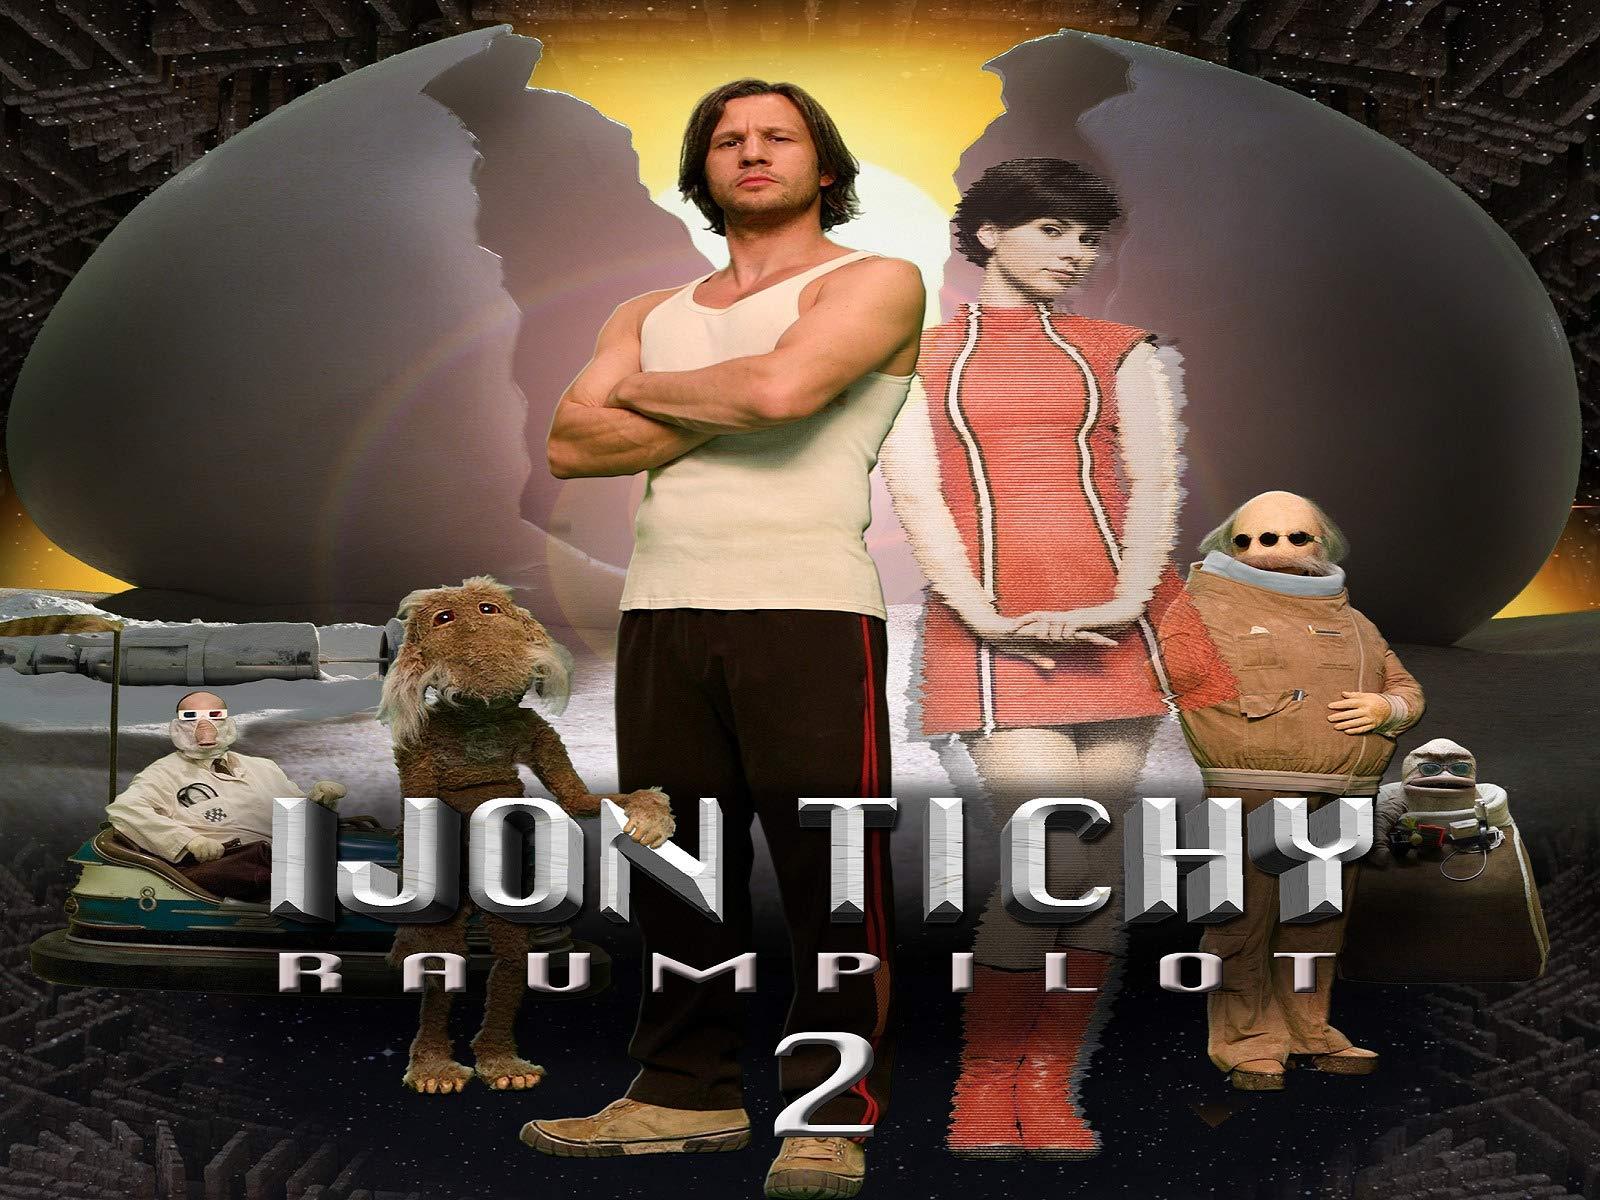 Amazon.de: Ijon Tichy Raumpilot ansehen | Prime Video